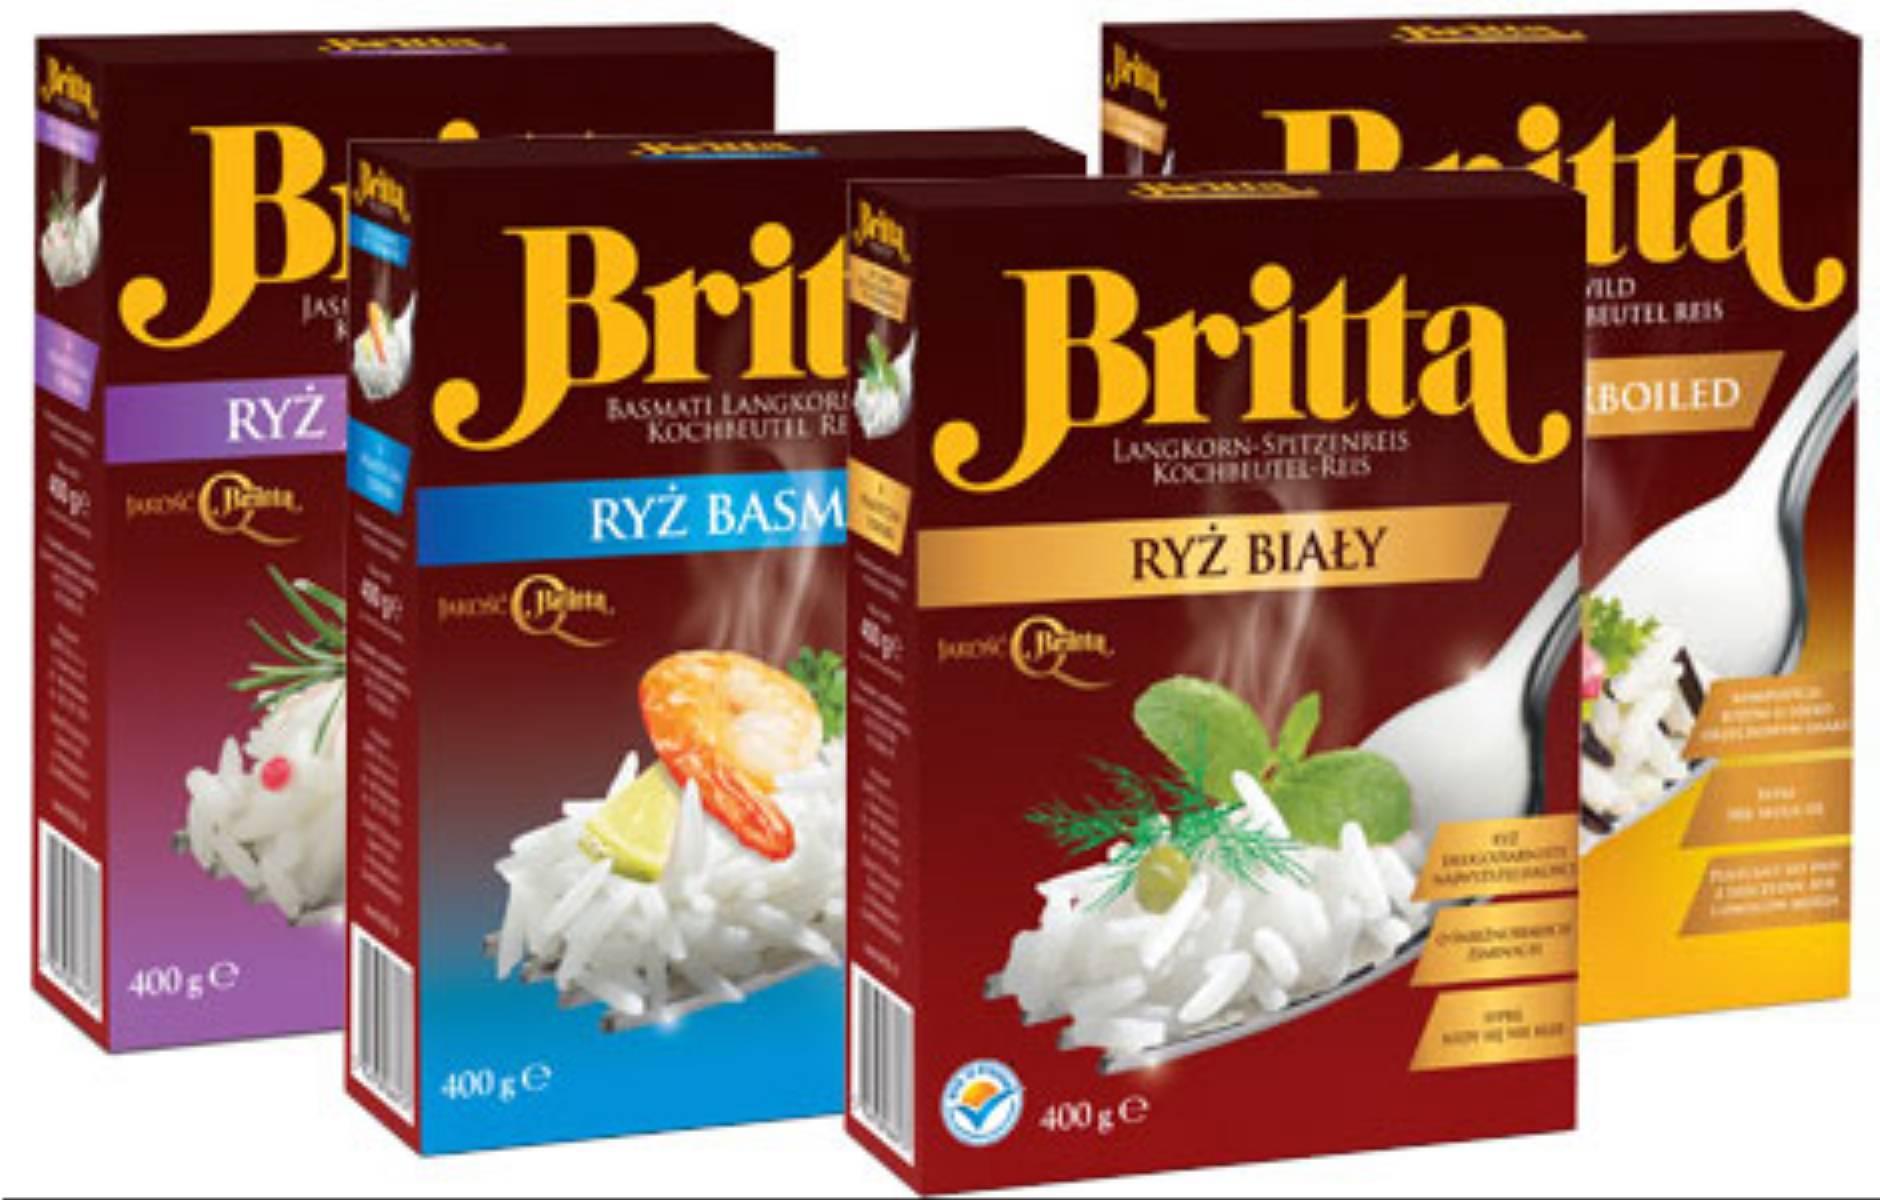 Ryze Britta